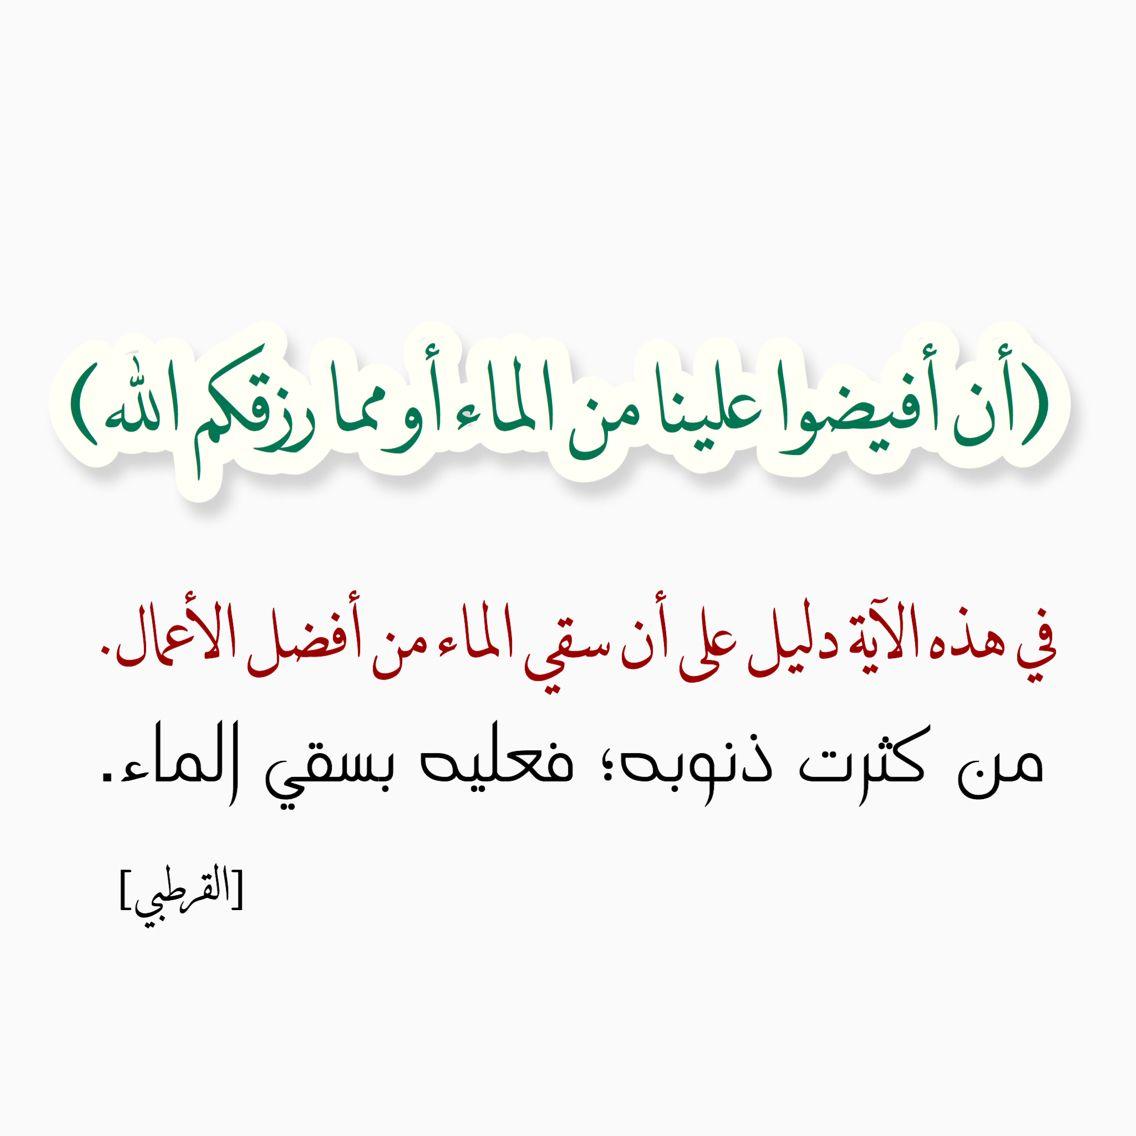 Desertrose سقيا الماء Windows Software Sayings Arabic